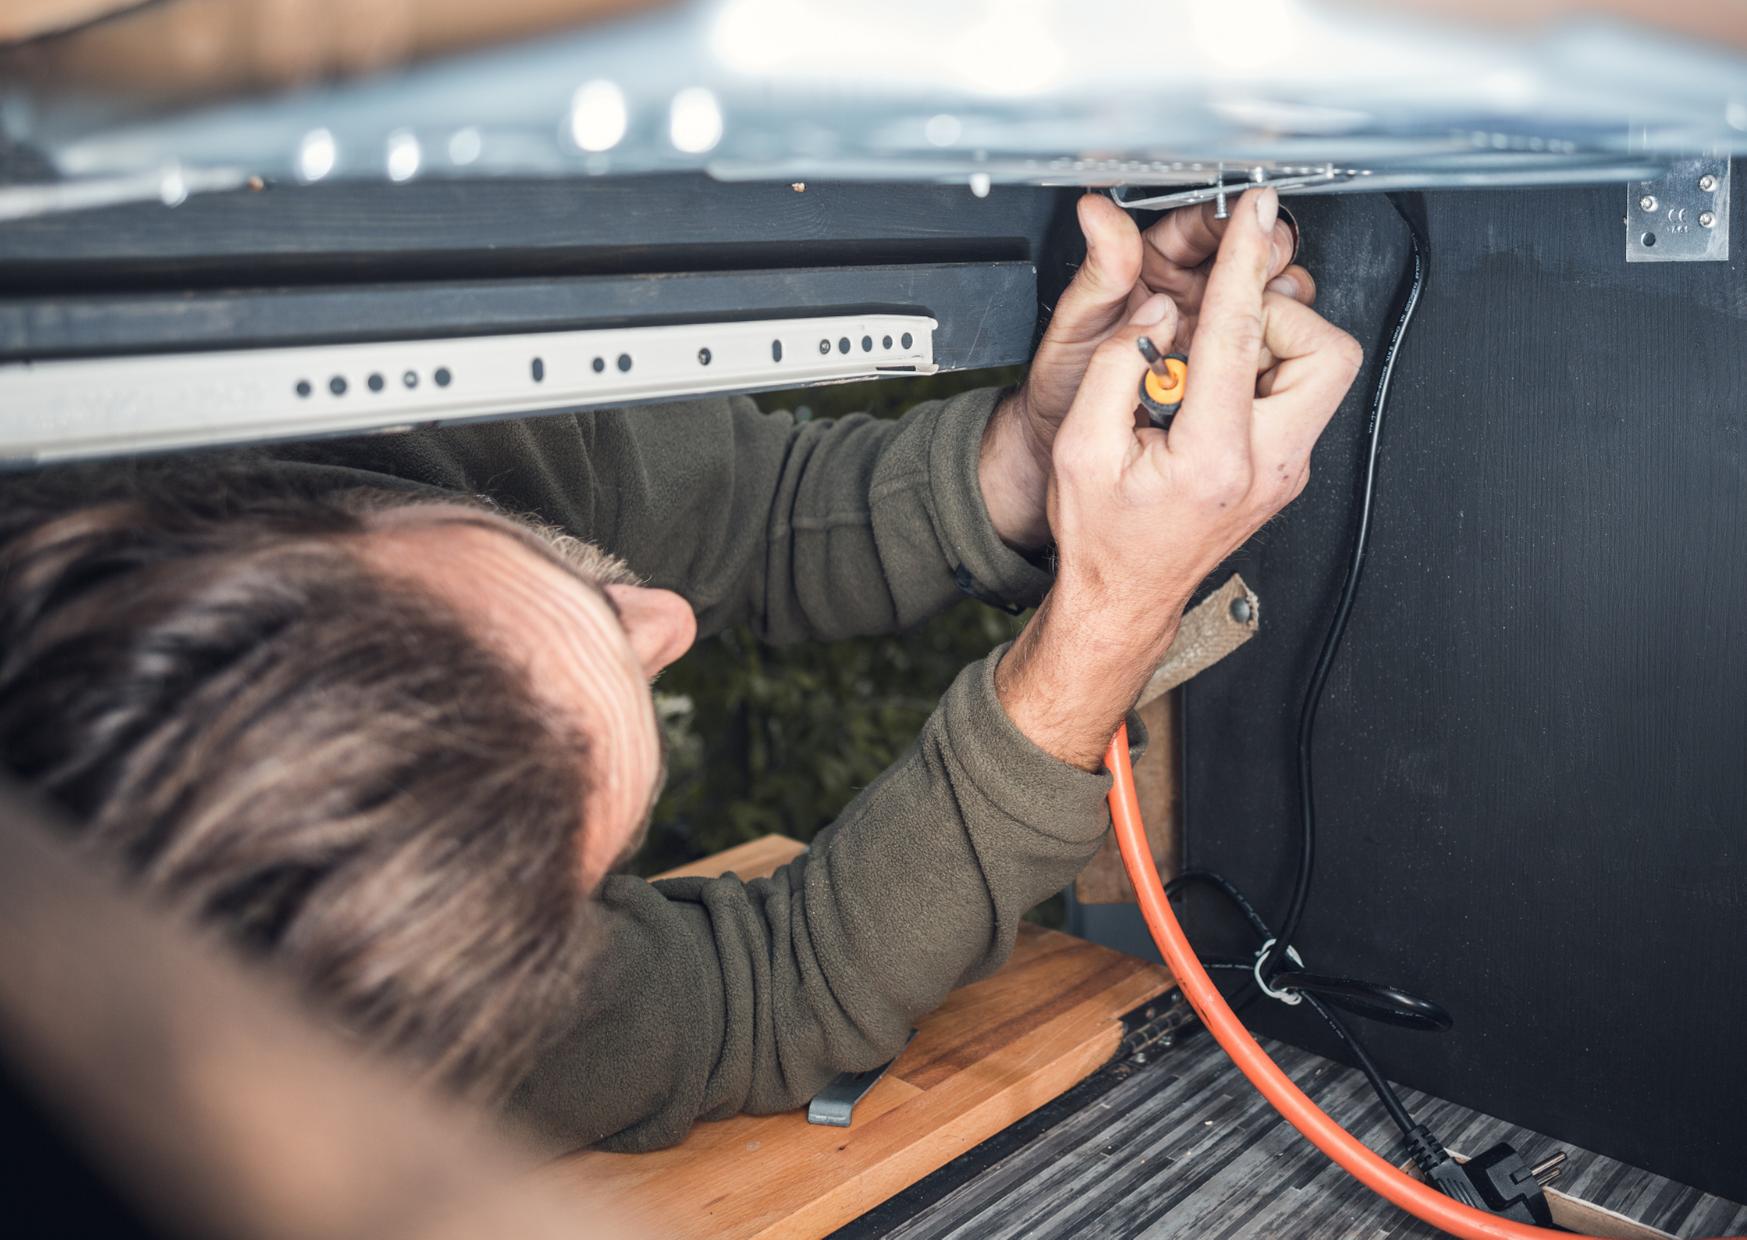 Man installing gas stove